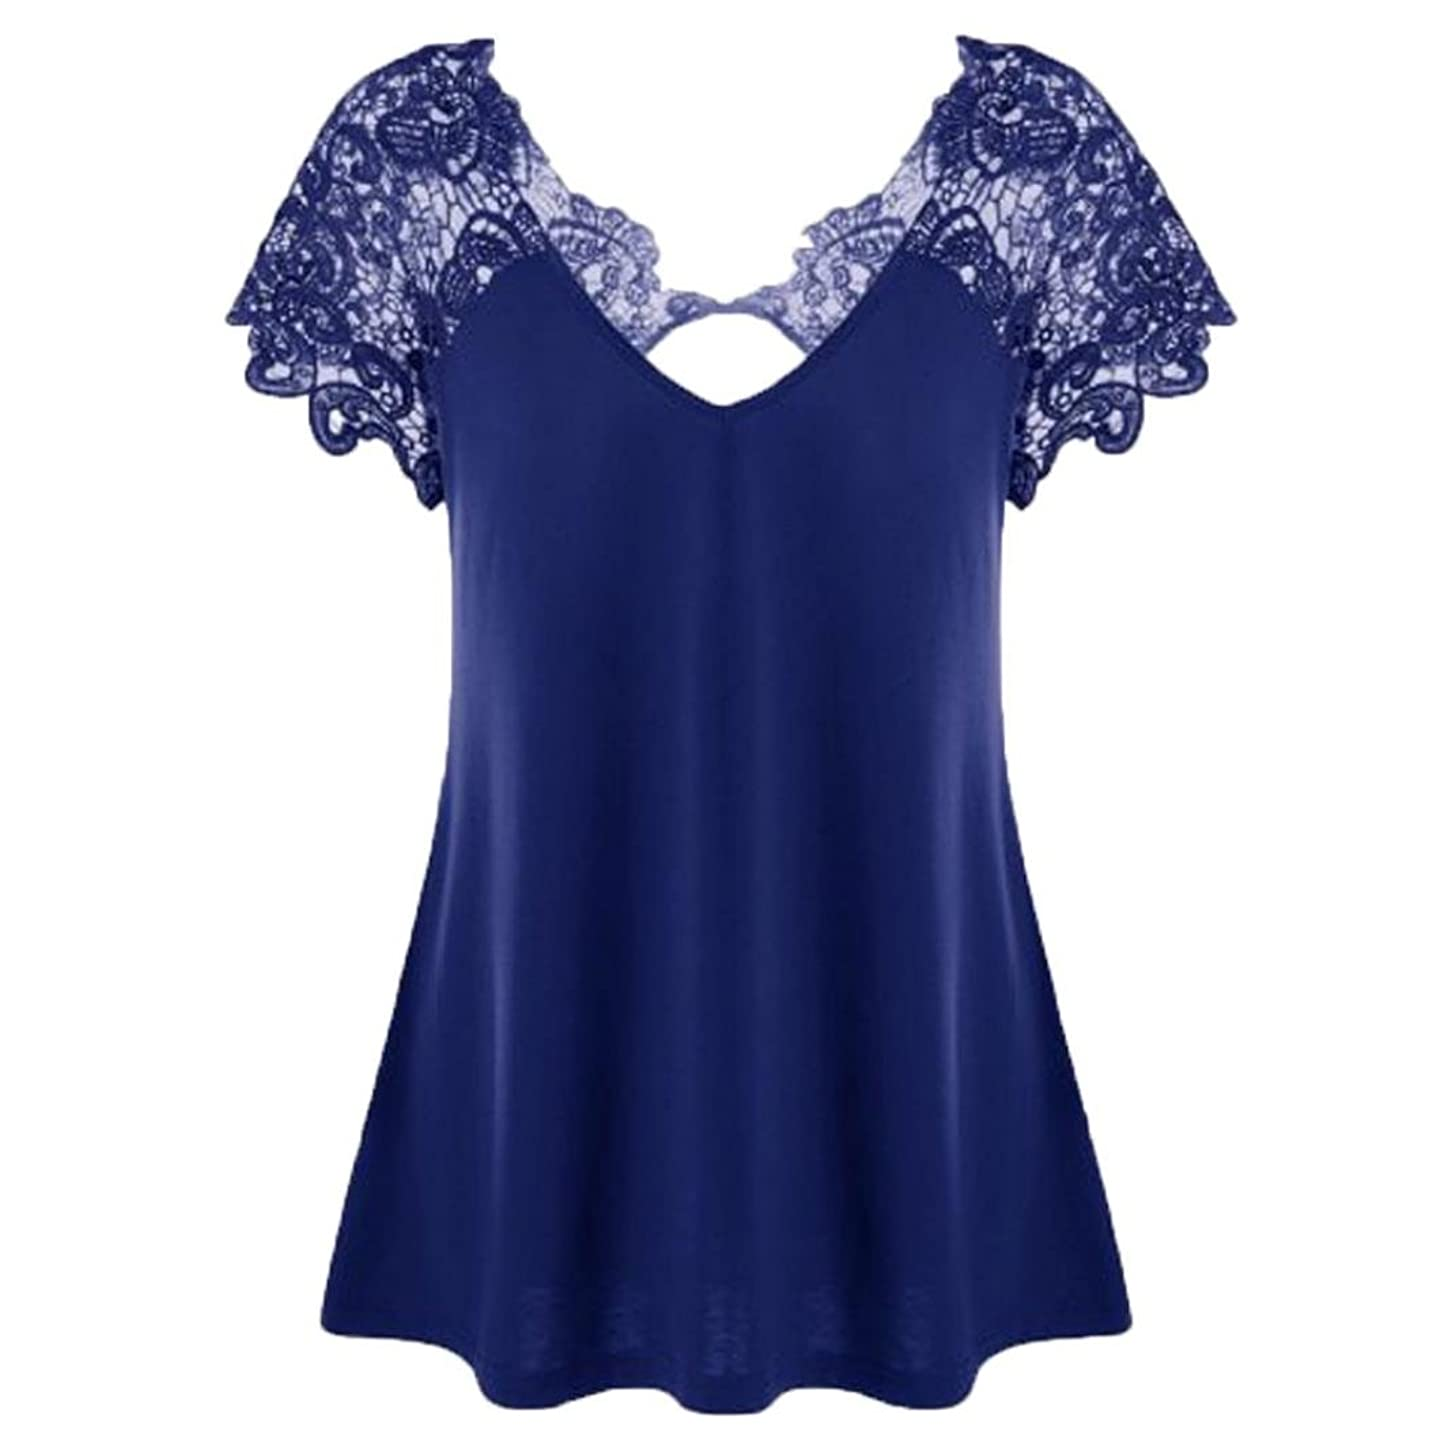 ????Egmy ?? Clearance ?? Fashion Women V-Neck Plus Size Lace Short Sleeve Trim Cutwork T-Shirt Tops (3XL, Blue)